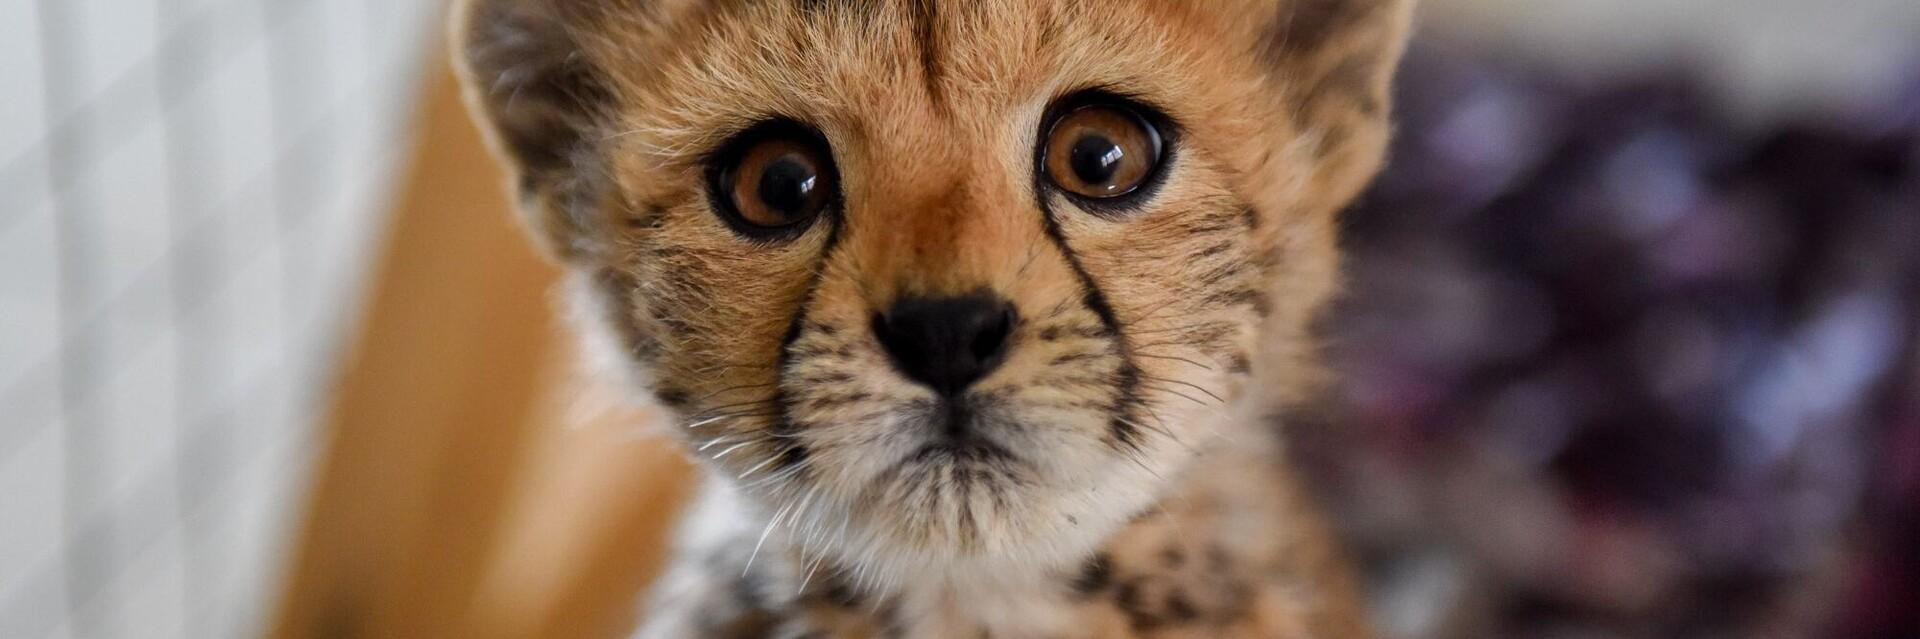 Help de cheetawelpjes